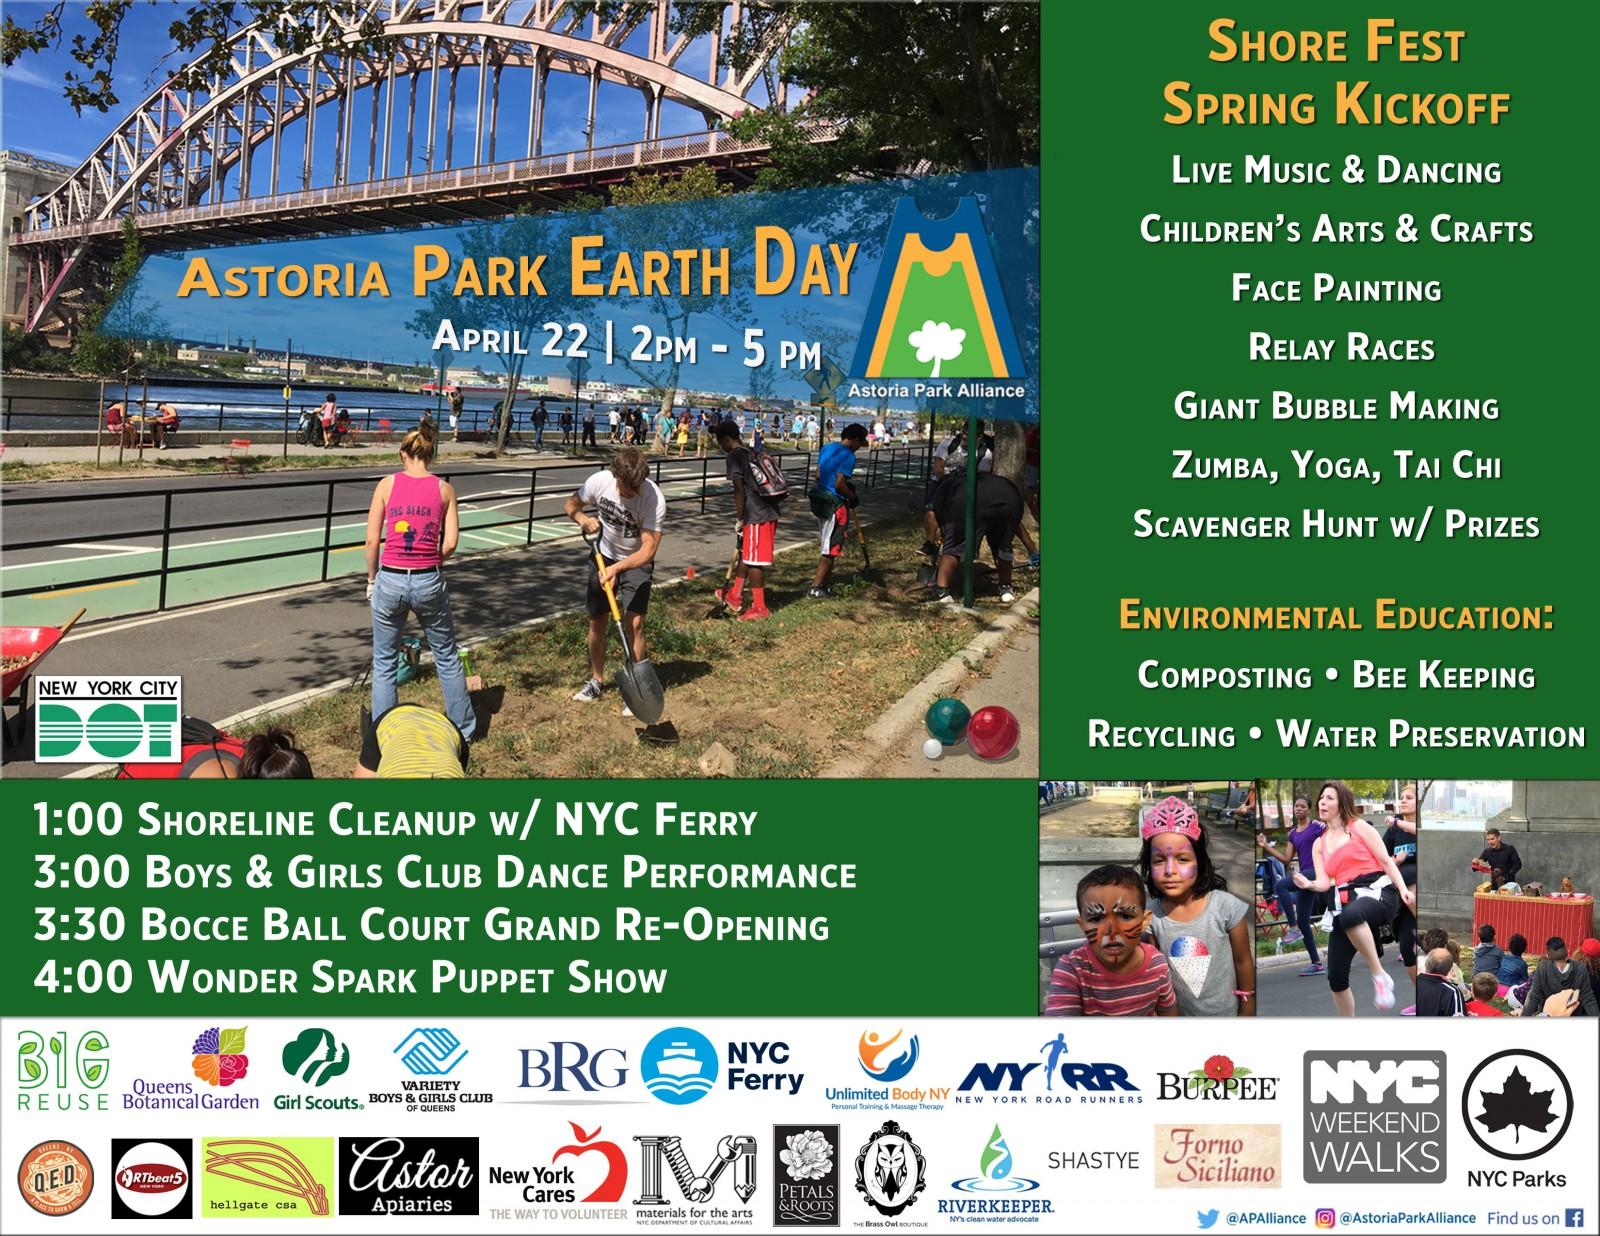 Astoria Park Earth Day Shore Fest